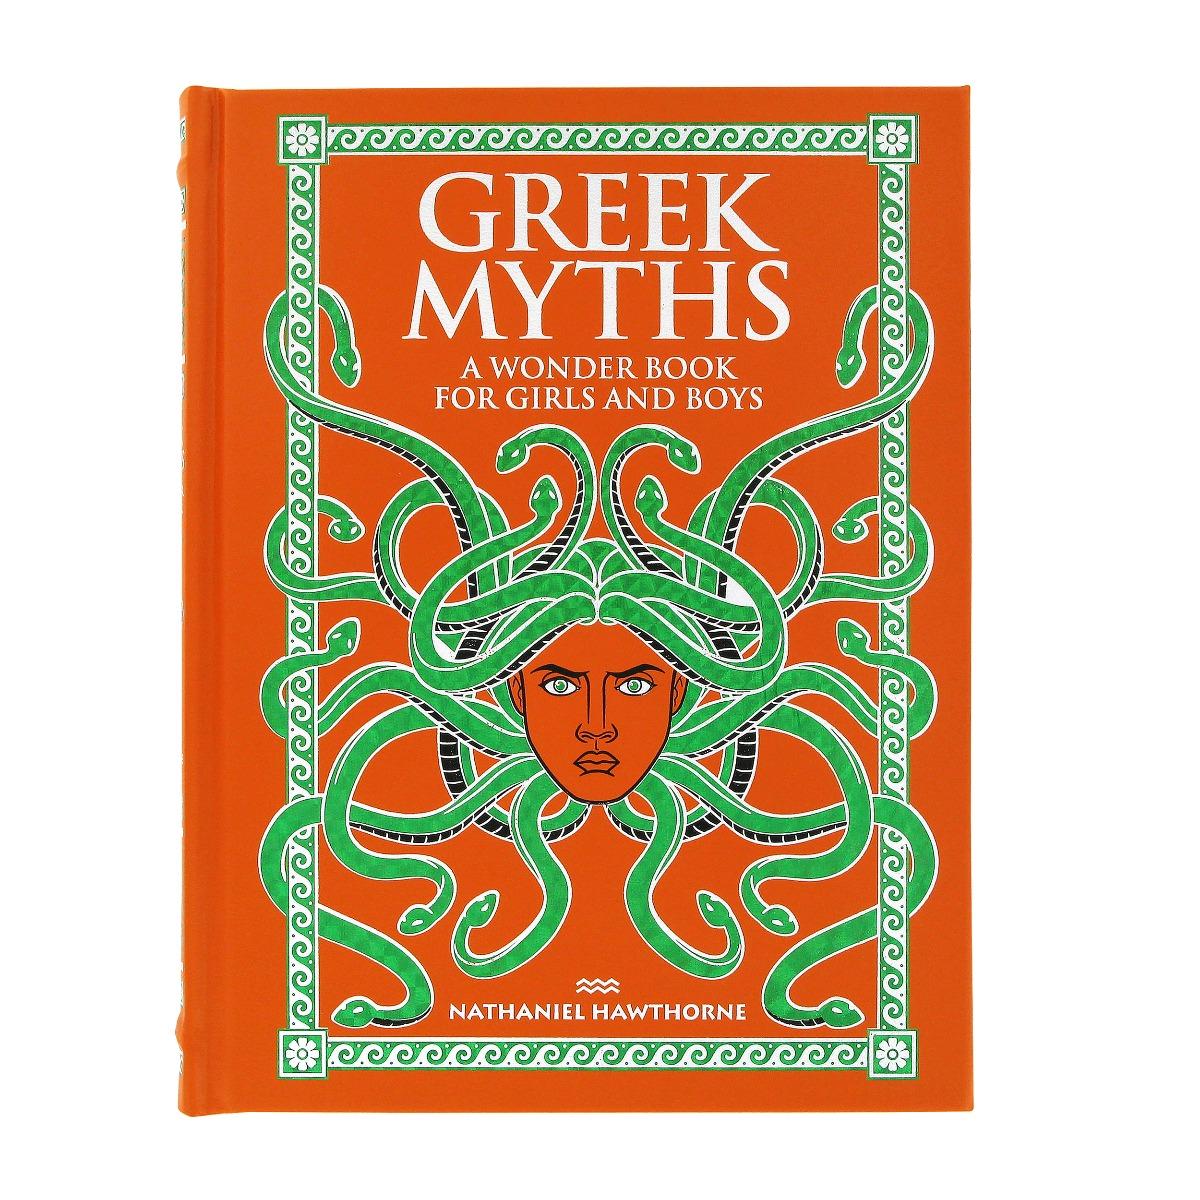 Greek Myths: A Wonder Book for Girls and Boys